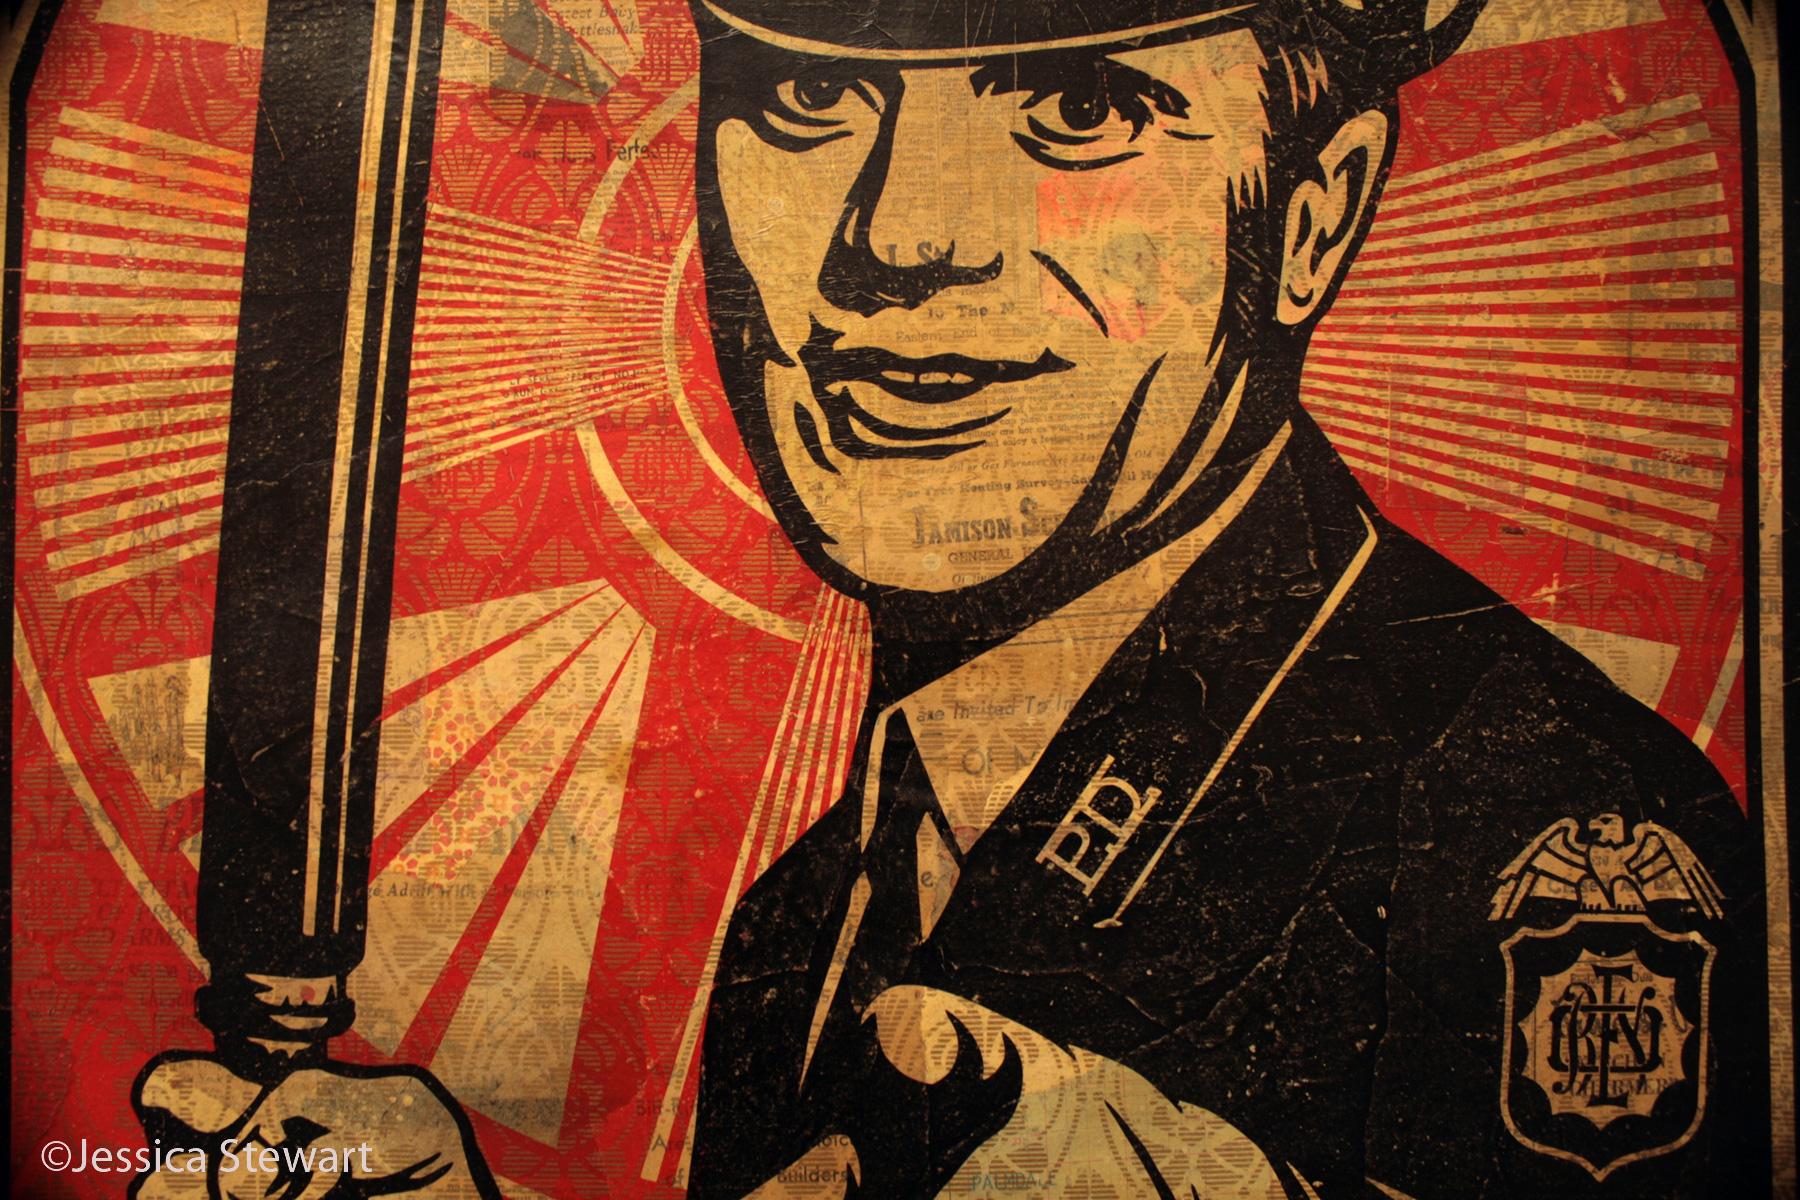 Shepard fairey wallpaper obey danaspadtop 1800x1200